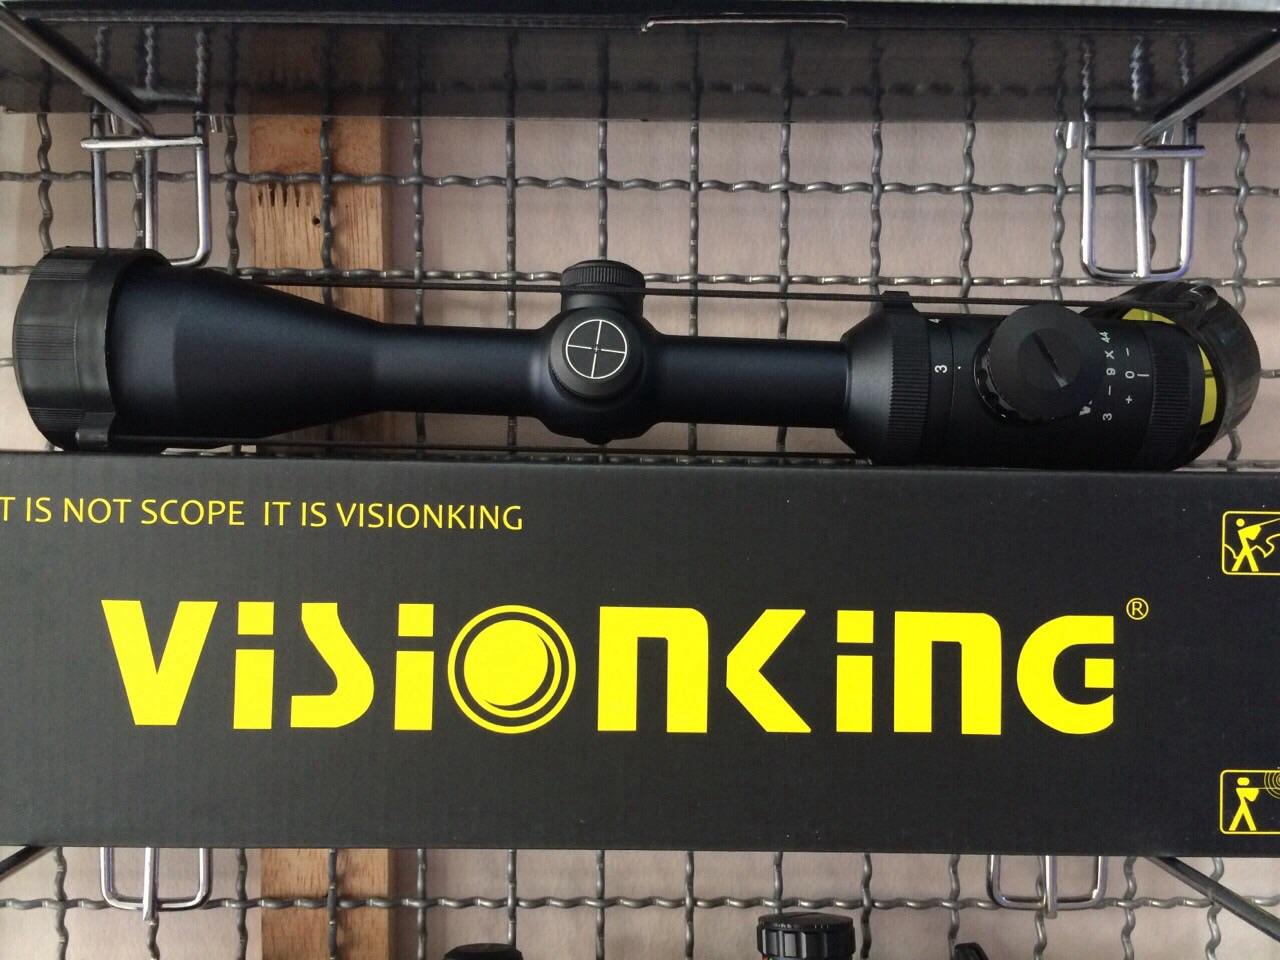 New.Visionking3- 9x44riflescopesขอบเขตปืนยาวสว่างmonotubeสำหรับการล่าสัตว์ทหาร1นิ้วสำหรับar15m16m4reticle ราคาพิเศษ